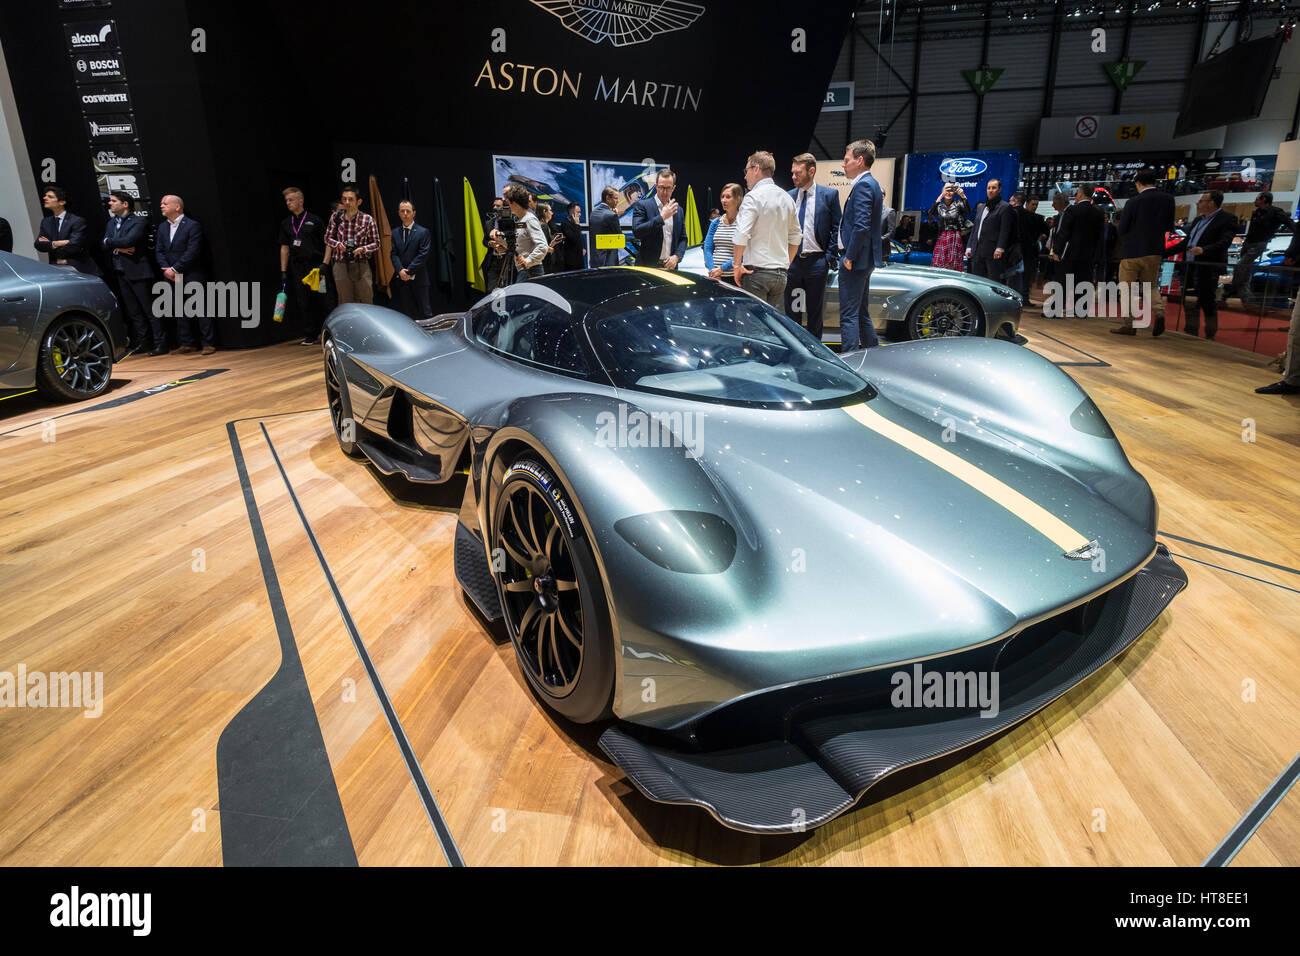 World premiere of Aston Martin AMR Valkyrie super car at Geneva International Motor Show 2017 - Stock Image